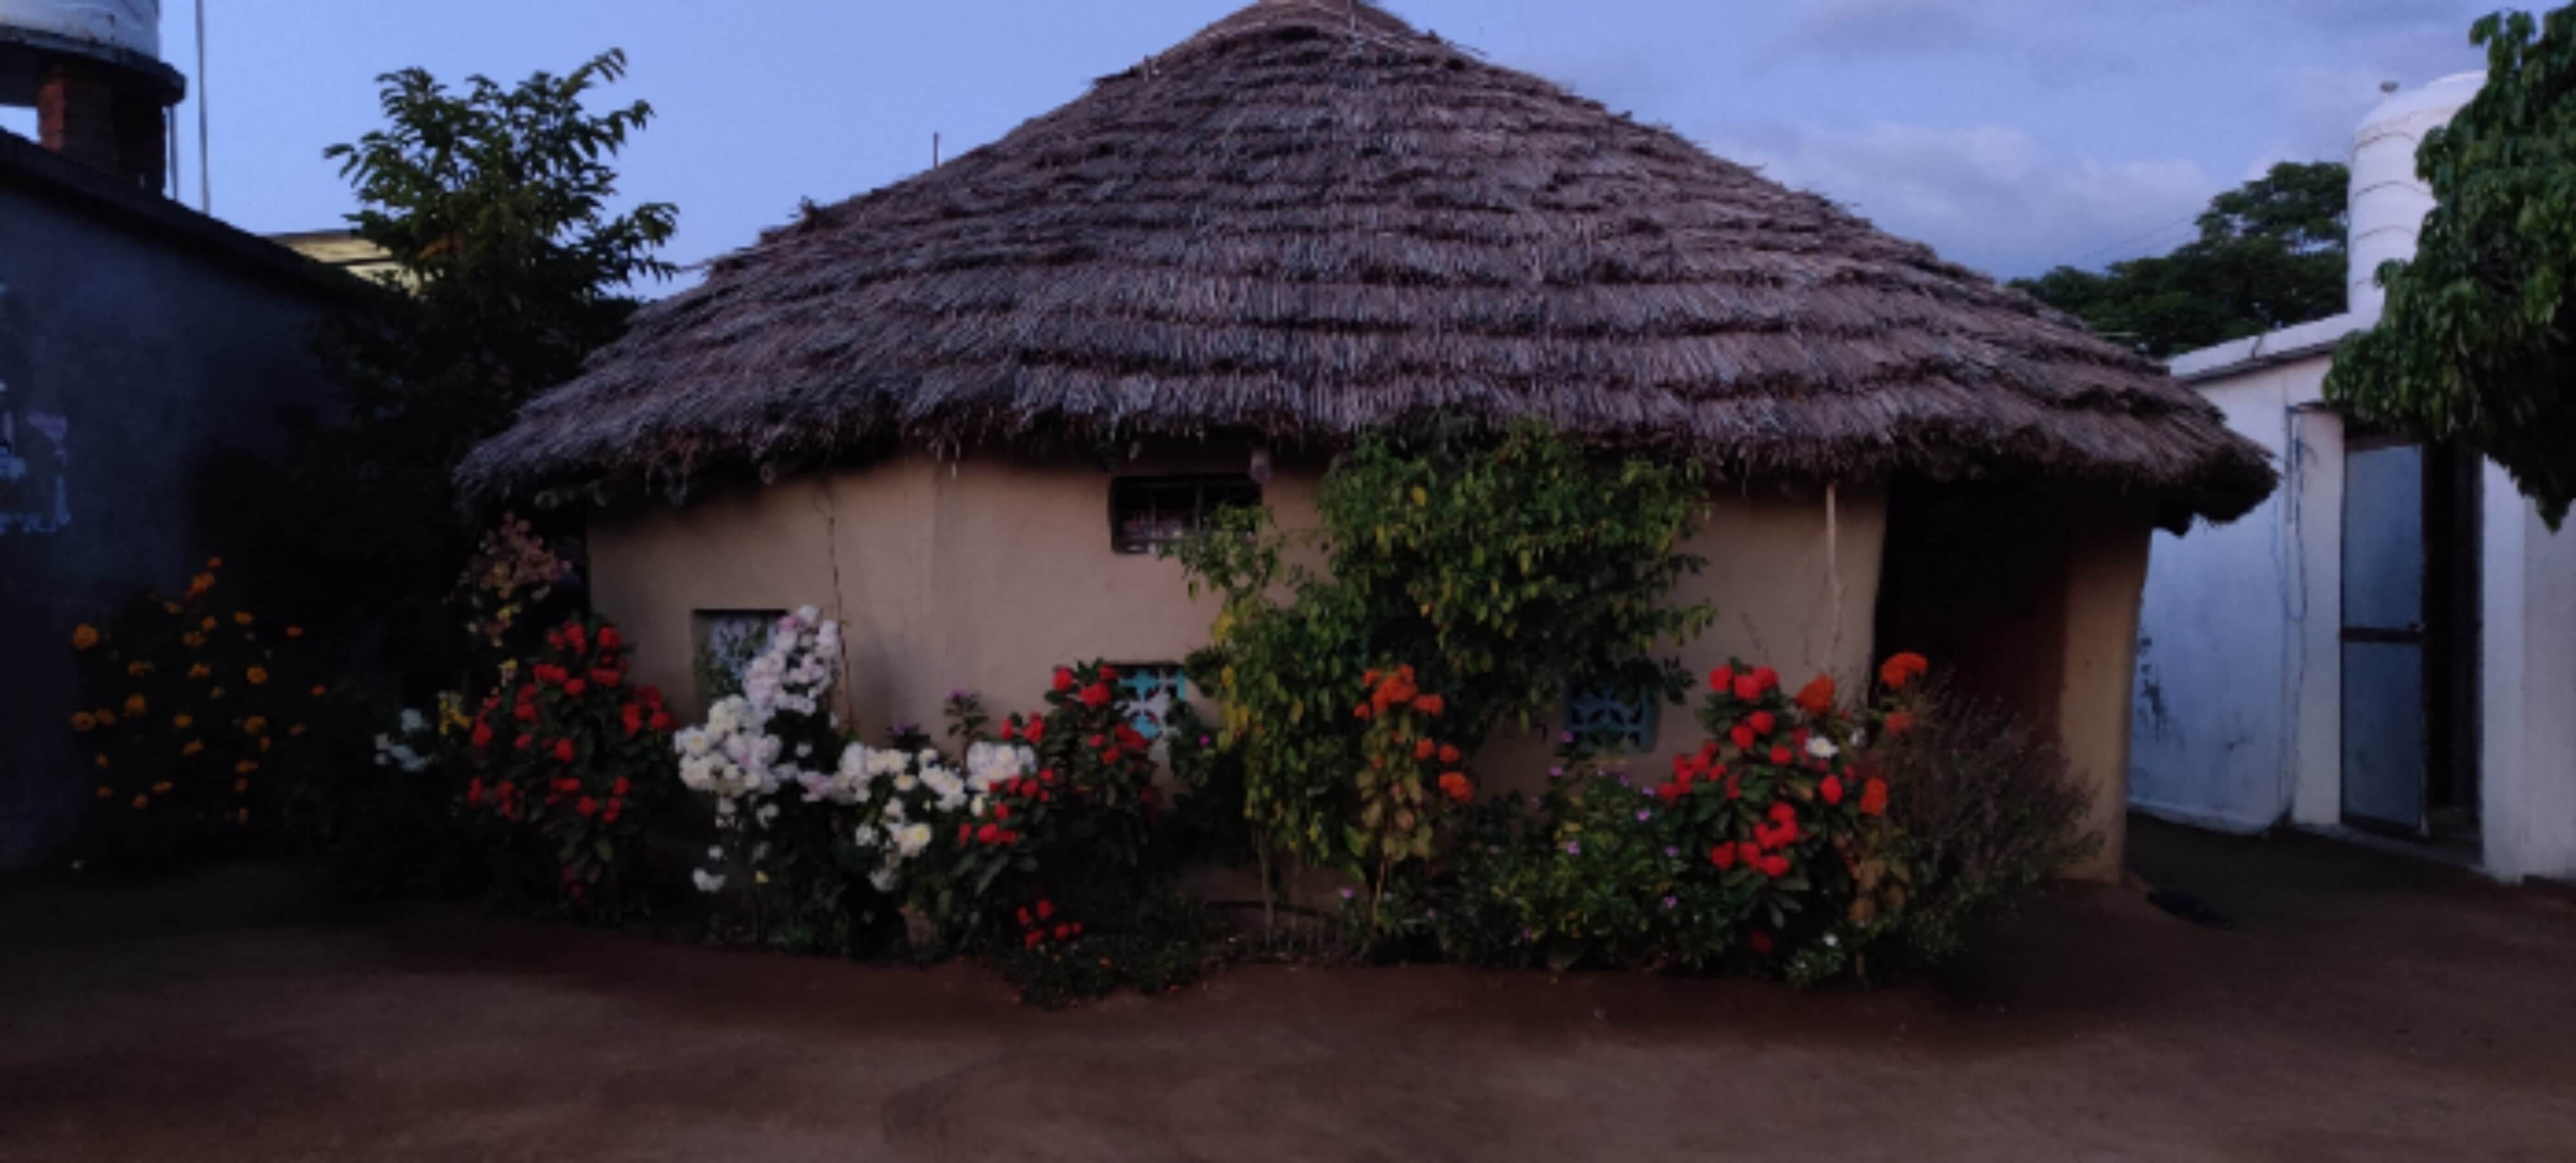 A Decorated Village Hut